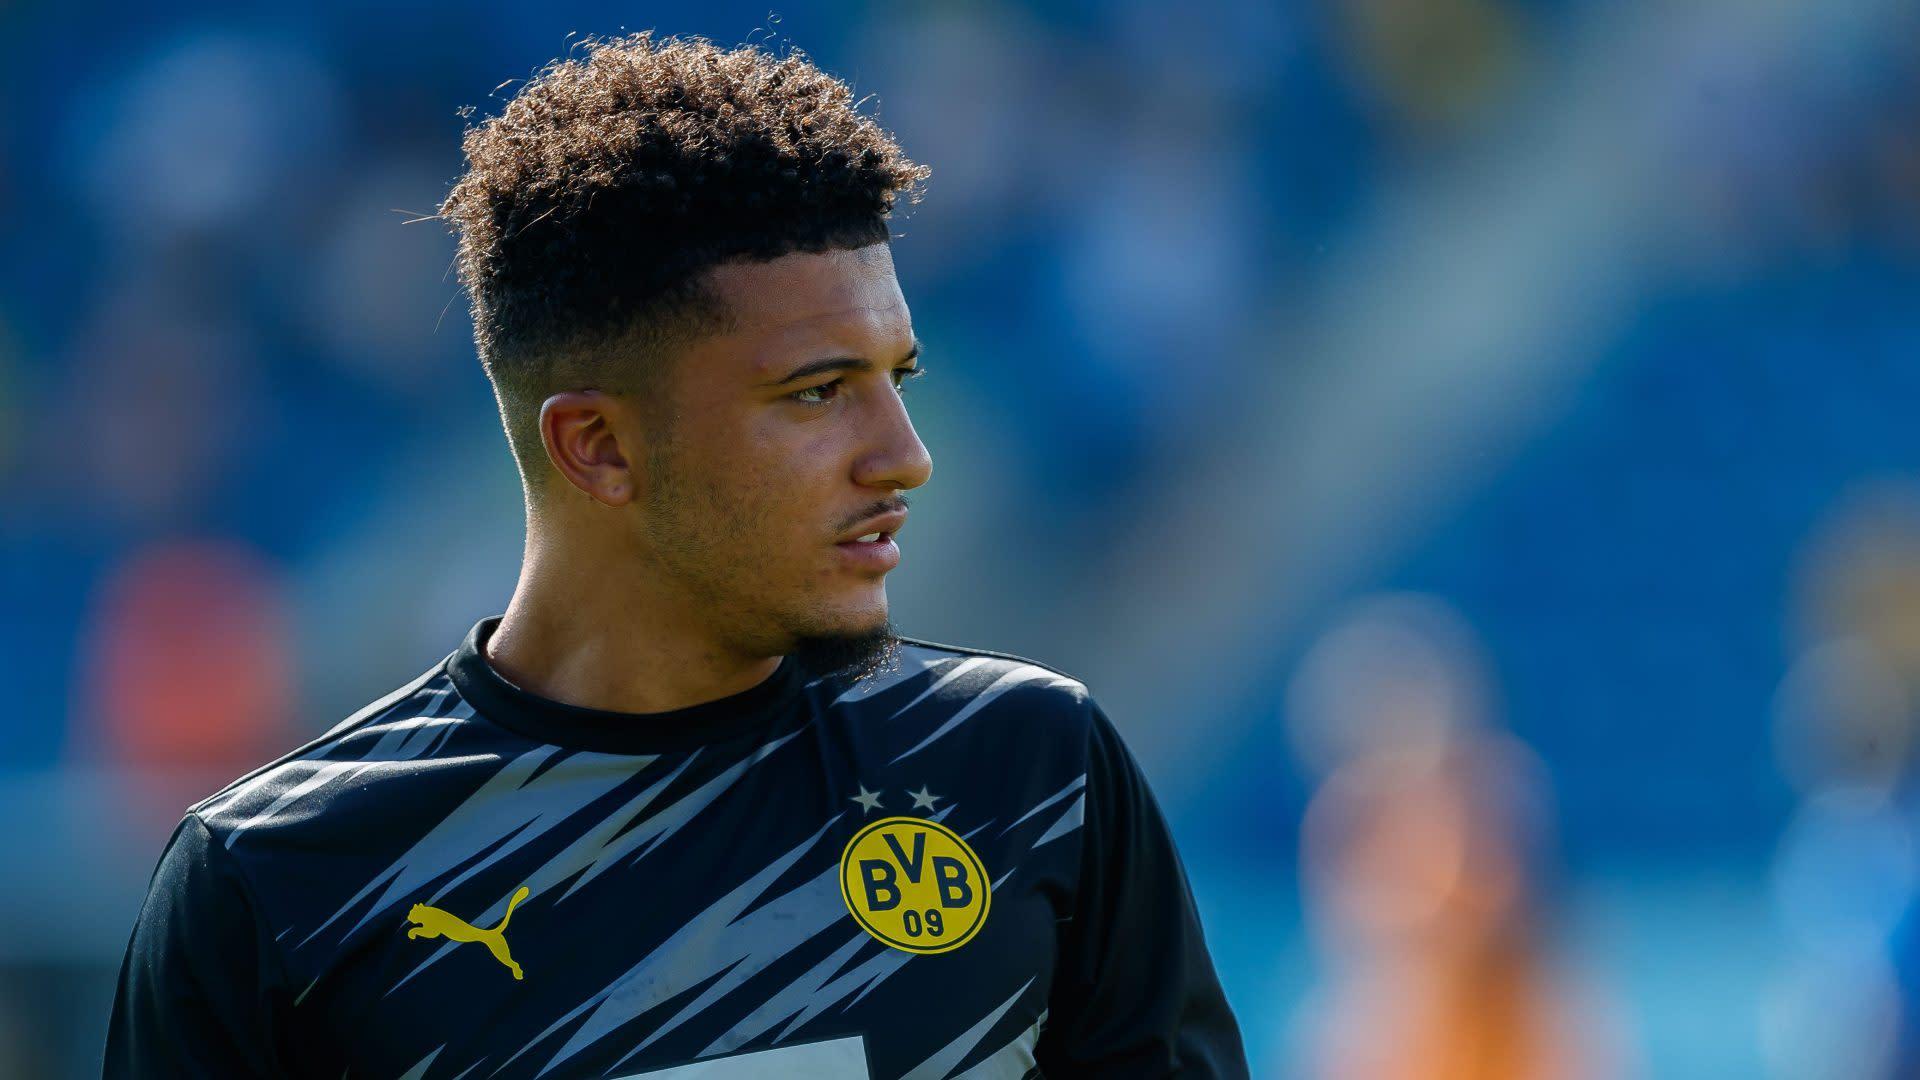 Transfer news: Sancho staying at Dortmund; Chilwell to Man Utd, Chelsea